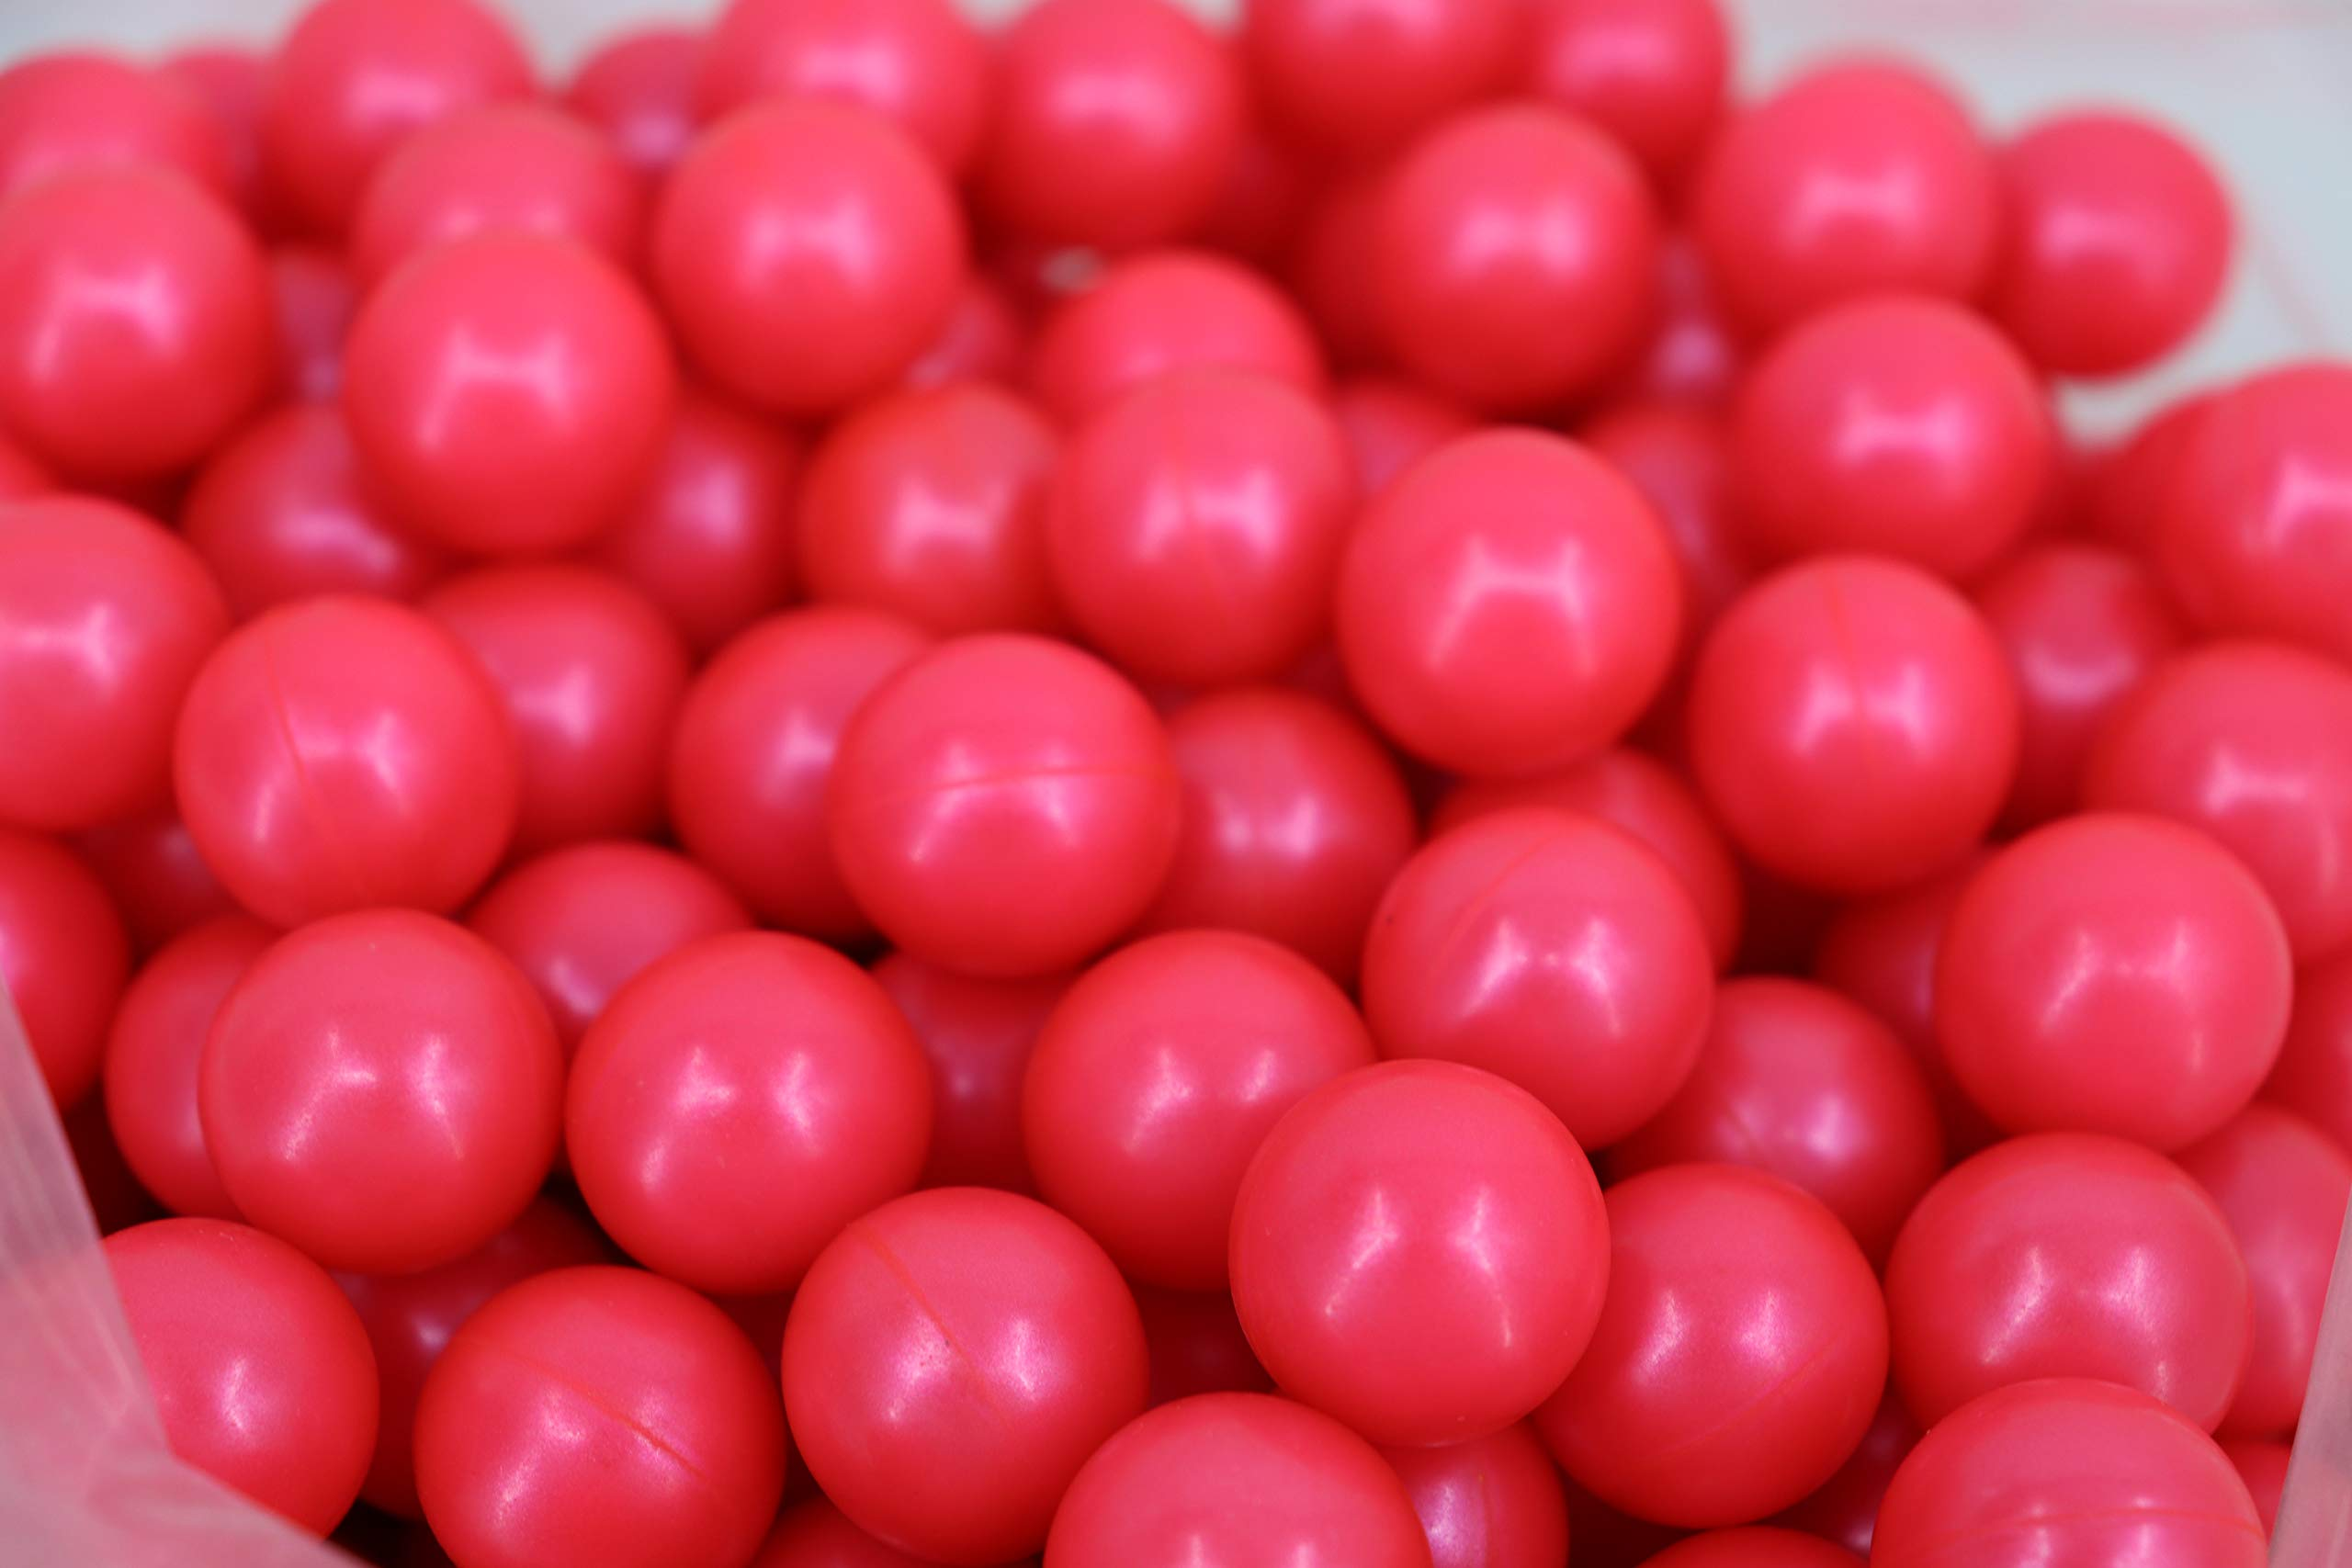 Valken Infinity Paintballs - 68cal - 2,000ct - Pink-Pink Fill by Valken